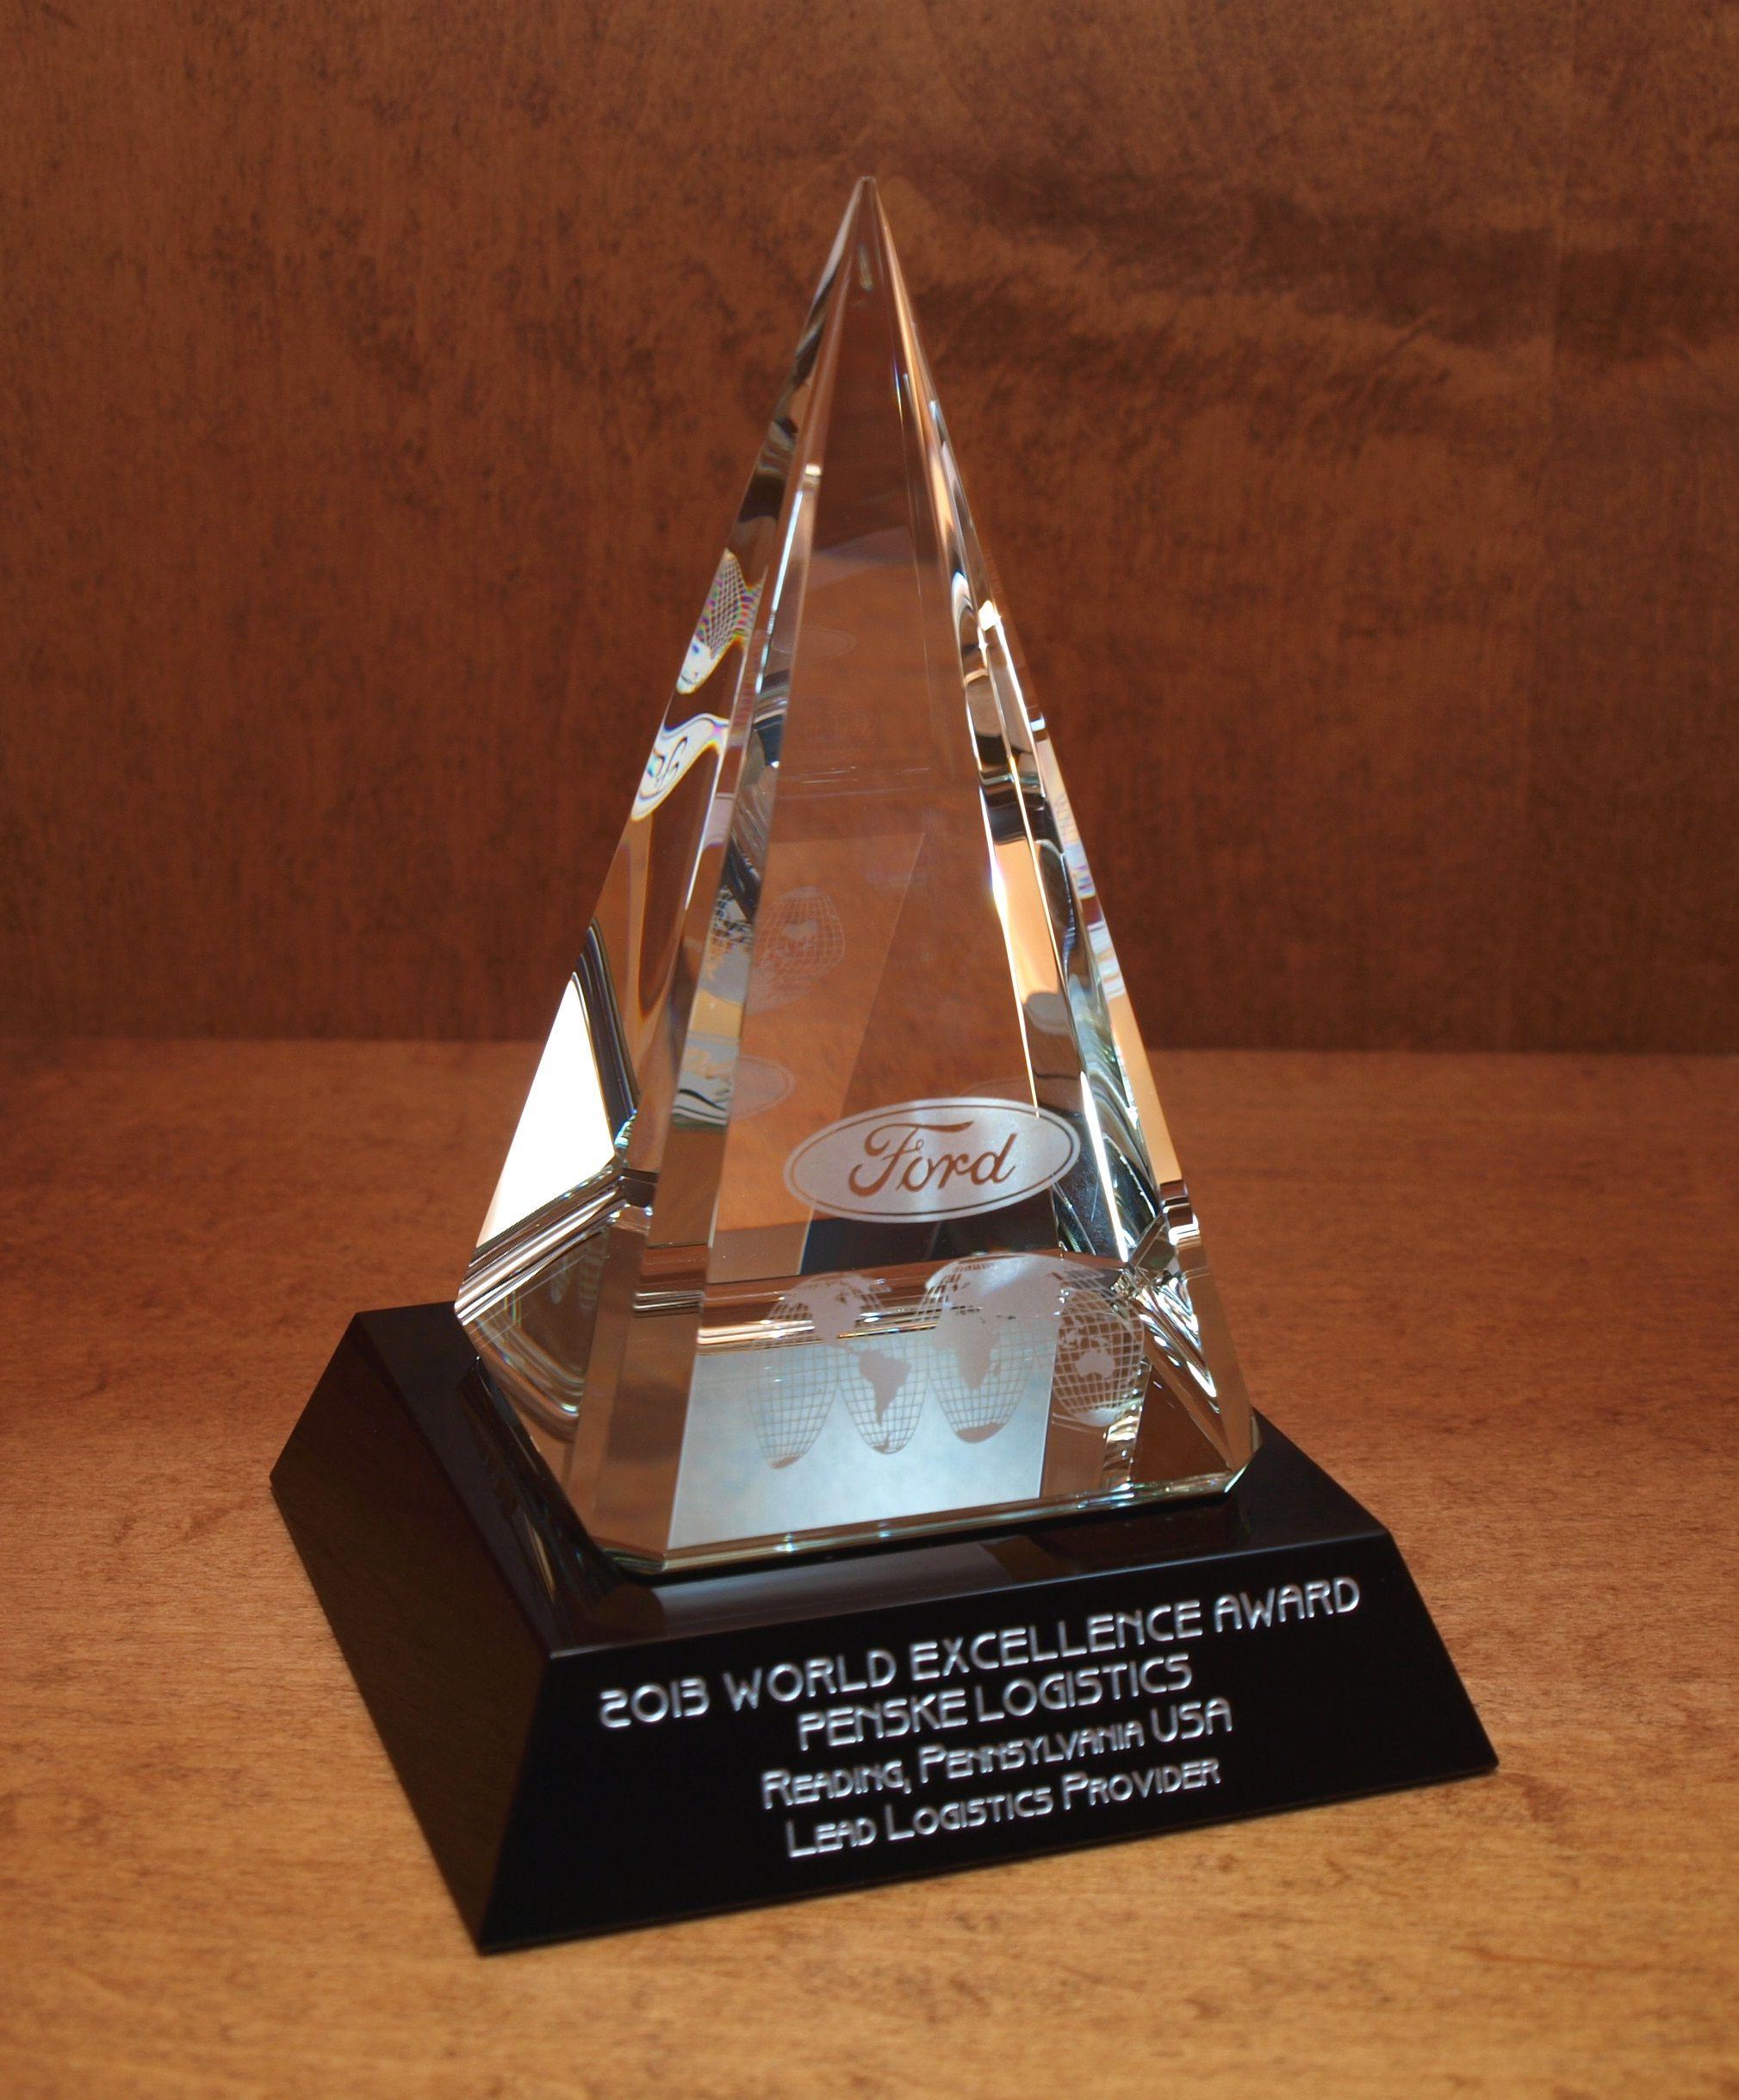 Penske Logistics Given Fourth Ford World Excellence Award